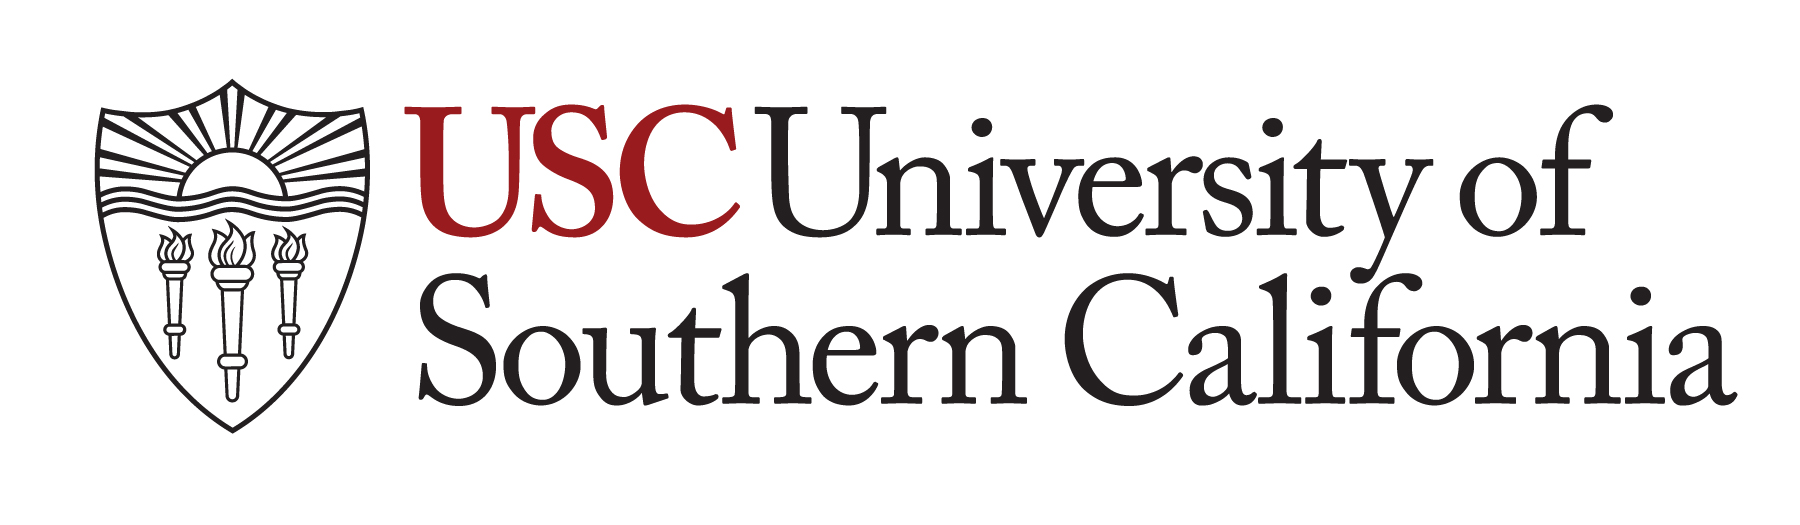 university of southern cal.jpg